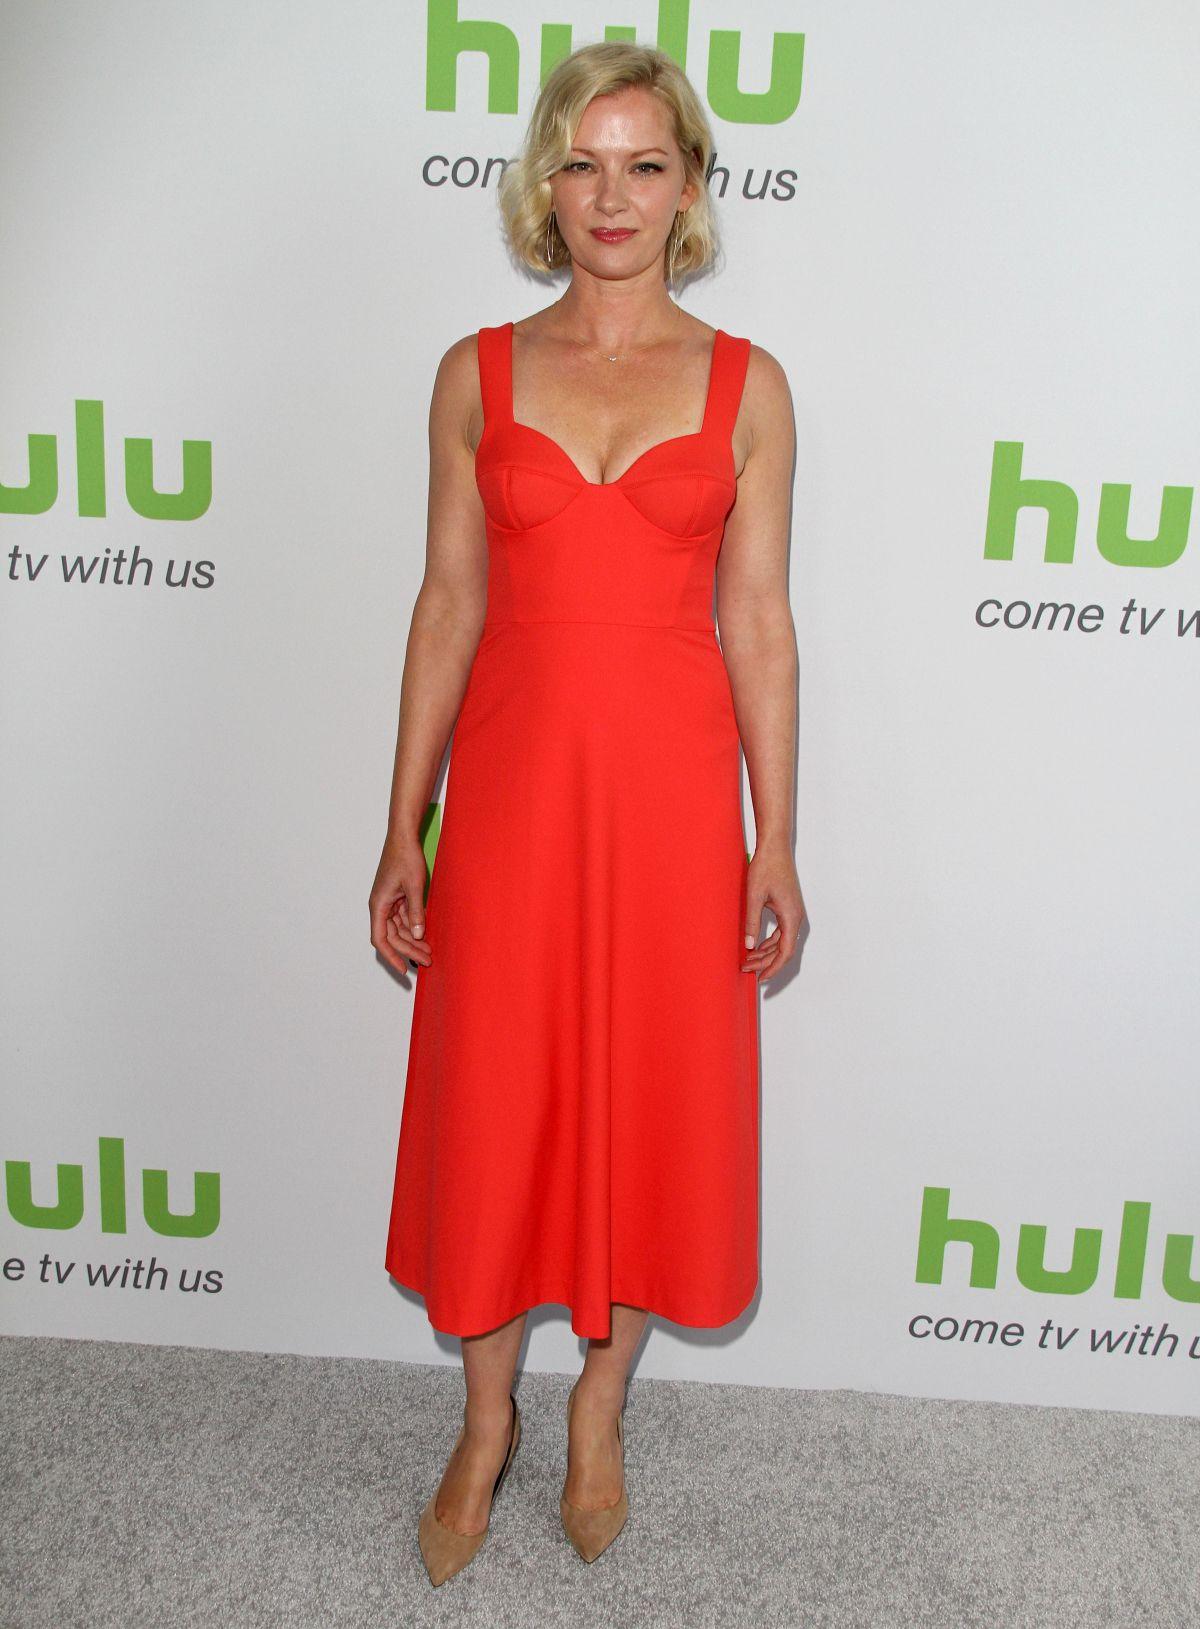 GRETCHEN MOL at Hulu Press Line at TCA Summer 2016 in Beverly Hills